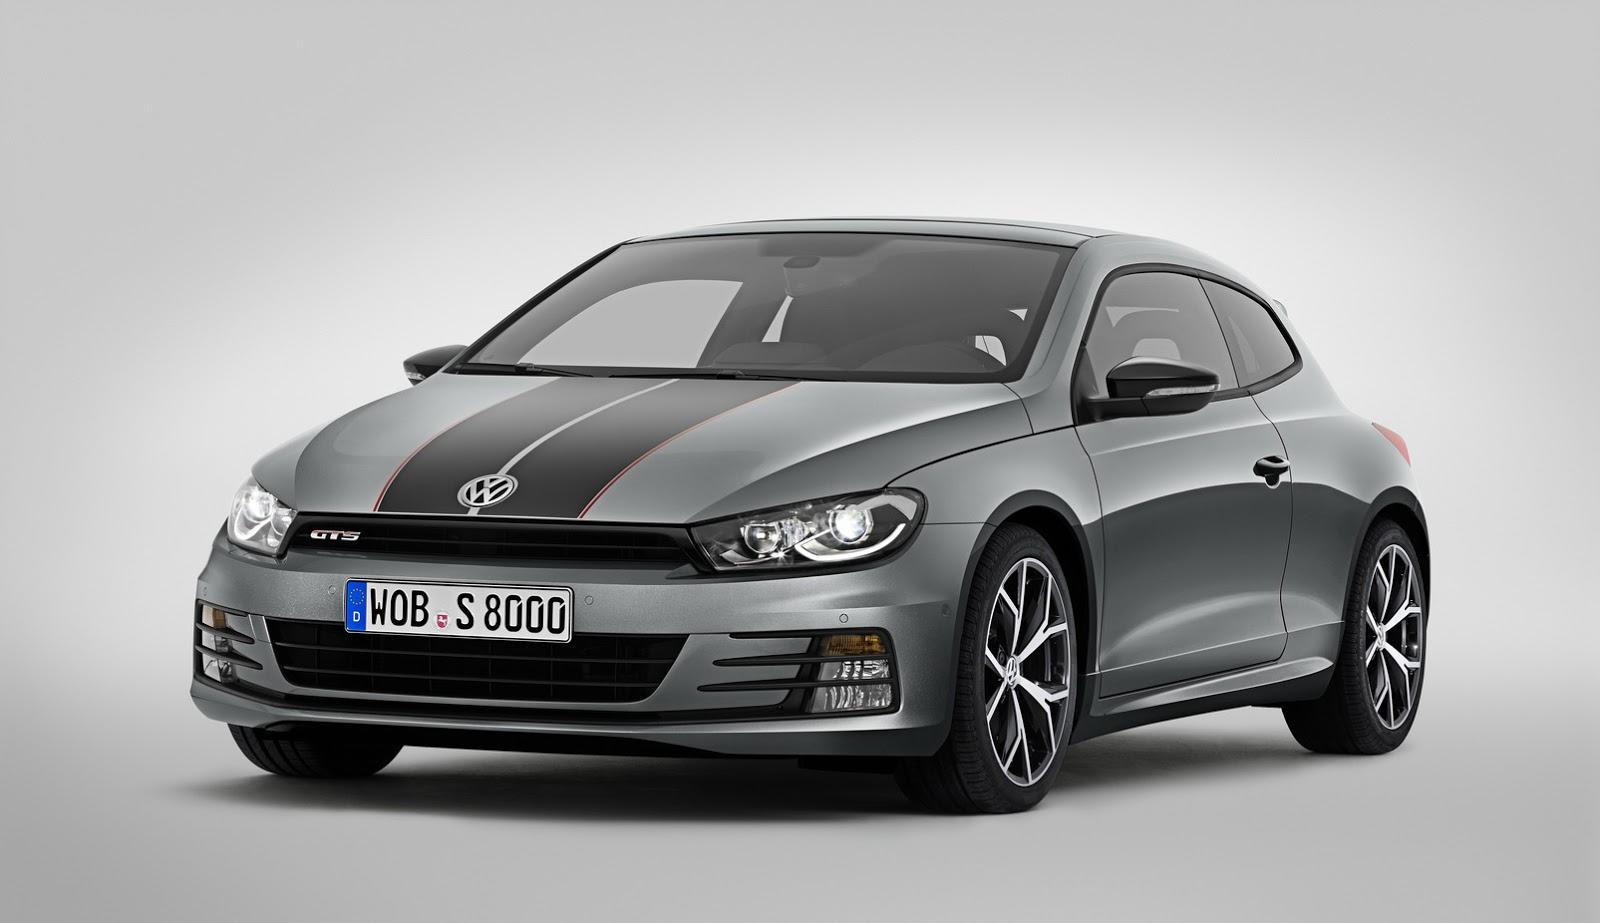 2015 VW Scirocco GTS Is a 220 HP Golf GTI Alternative - autoevolution